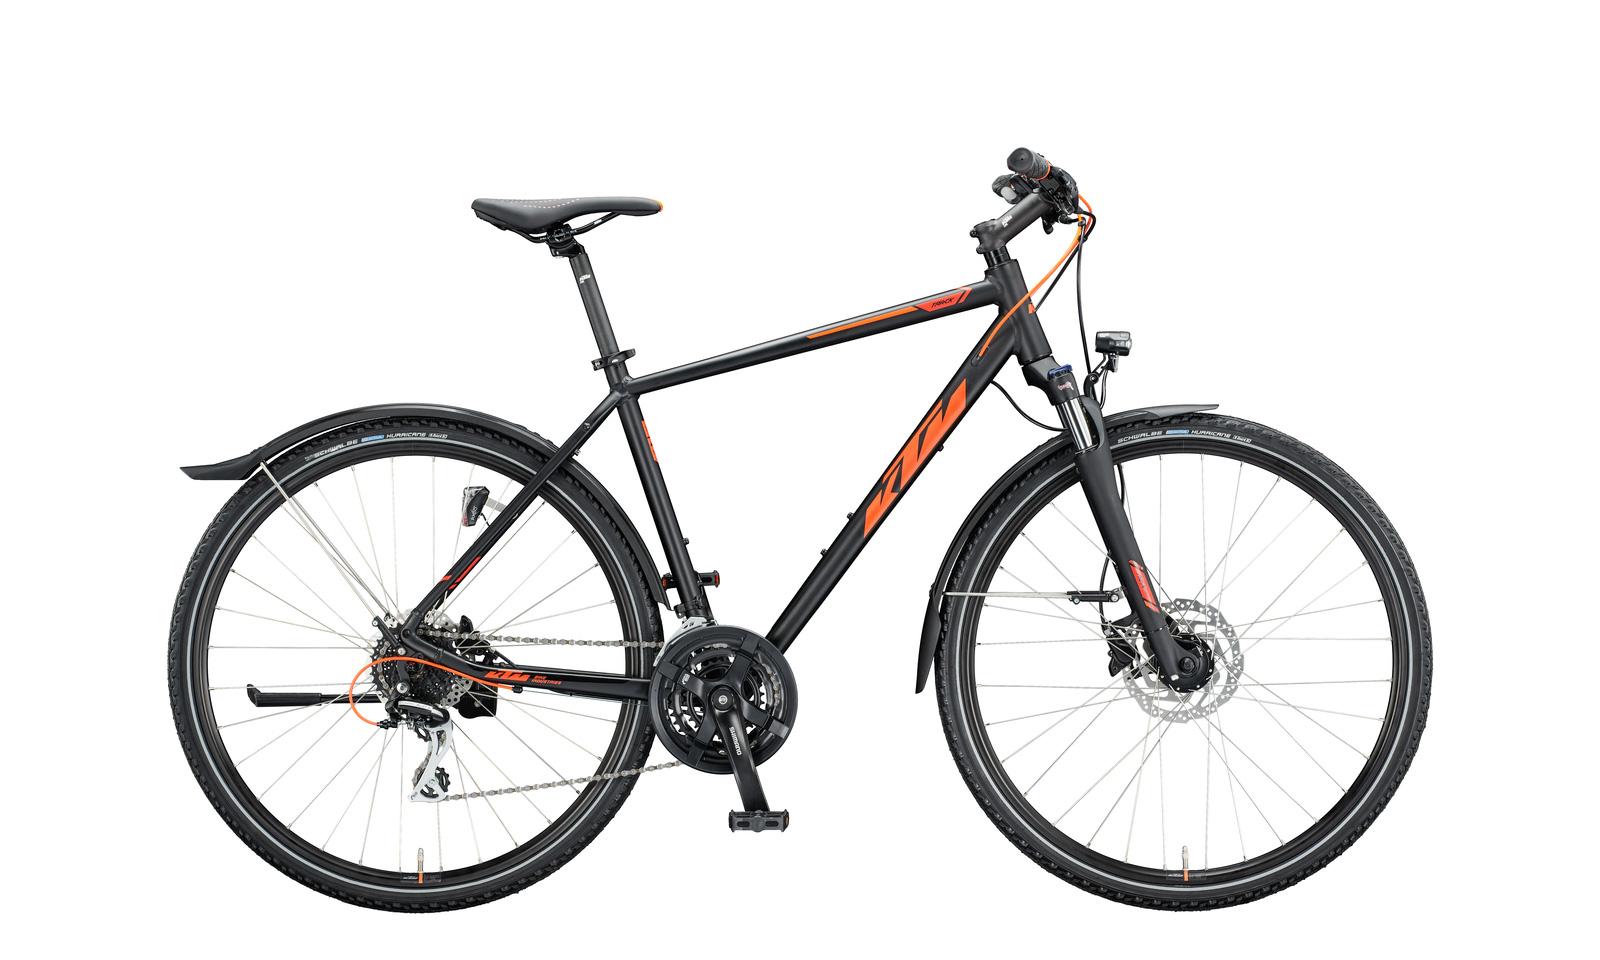 Biciclete KTM Trekking Offroad LIFE TRACK STREET 3x8 Shimano Acera